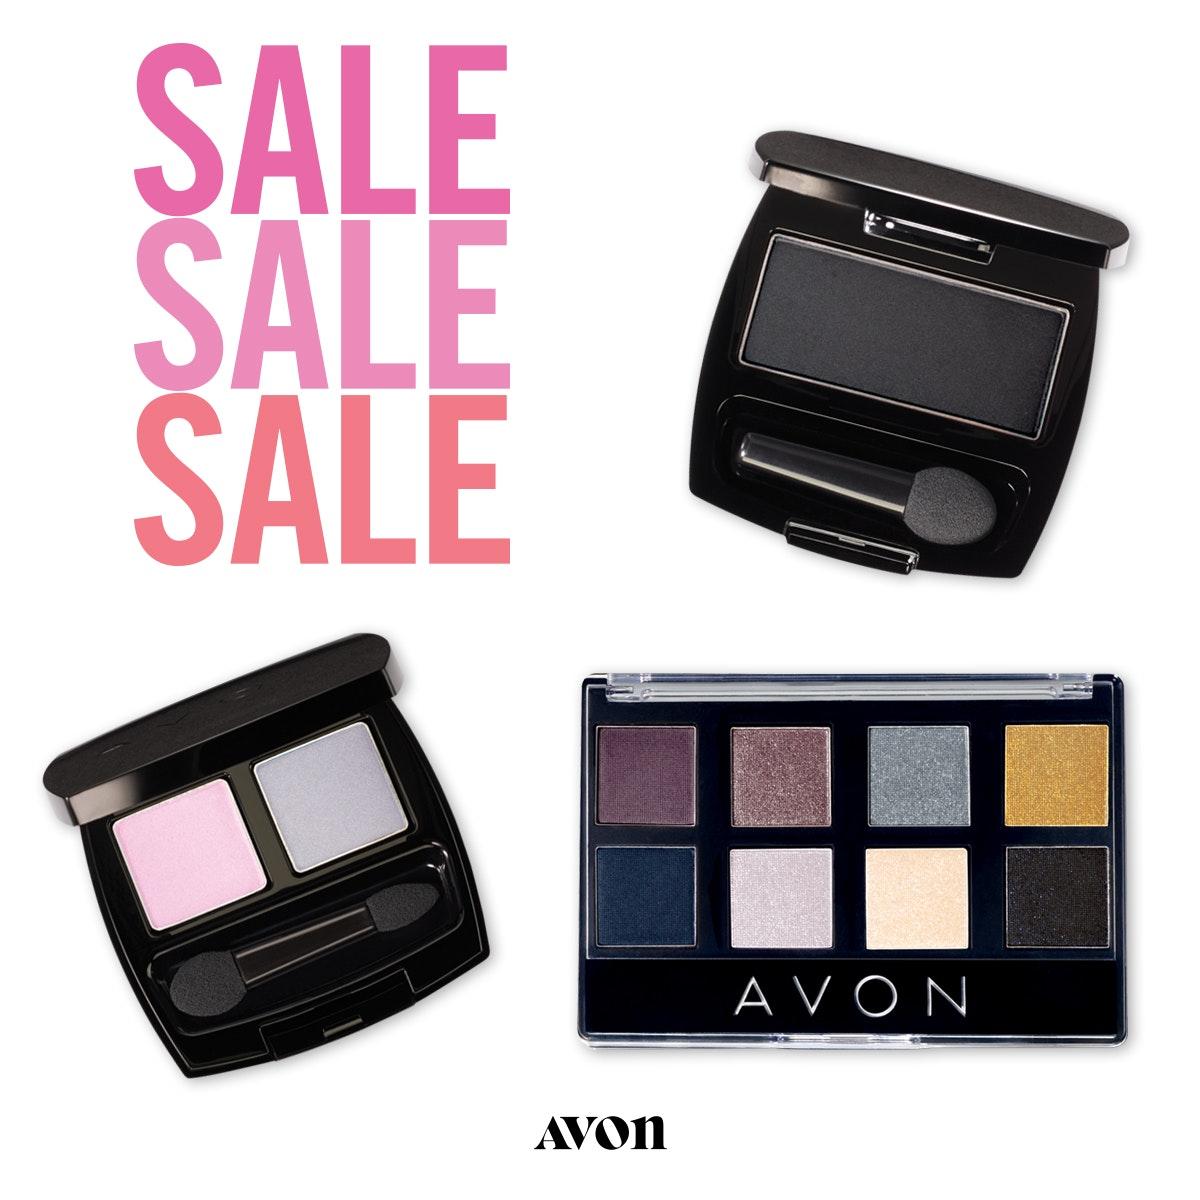 Avon Makeup Outlet